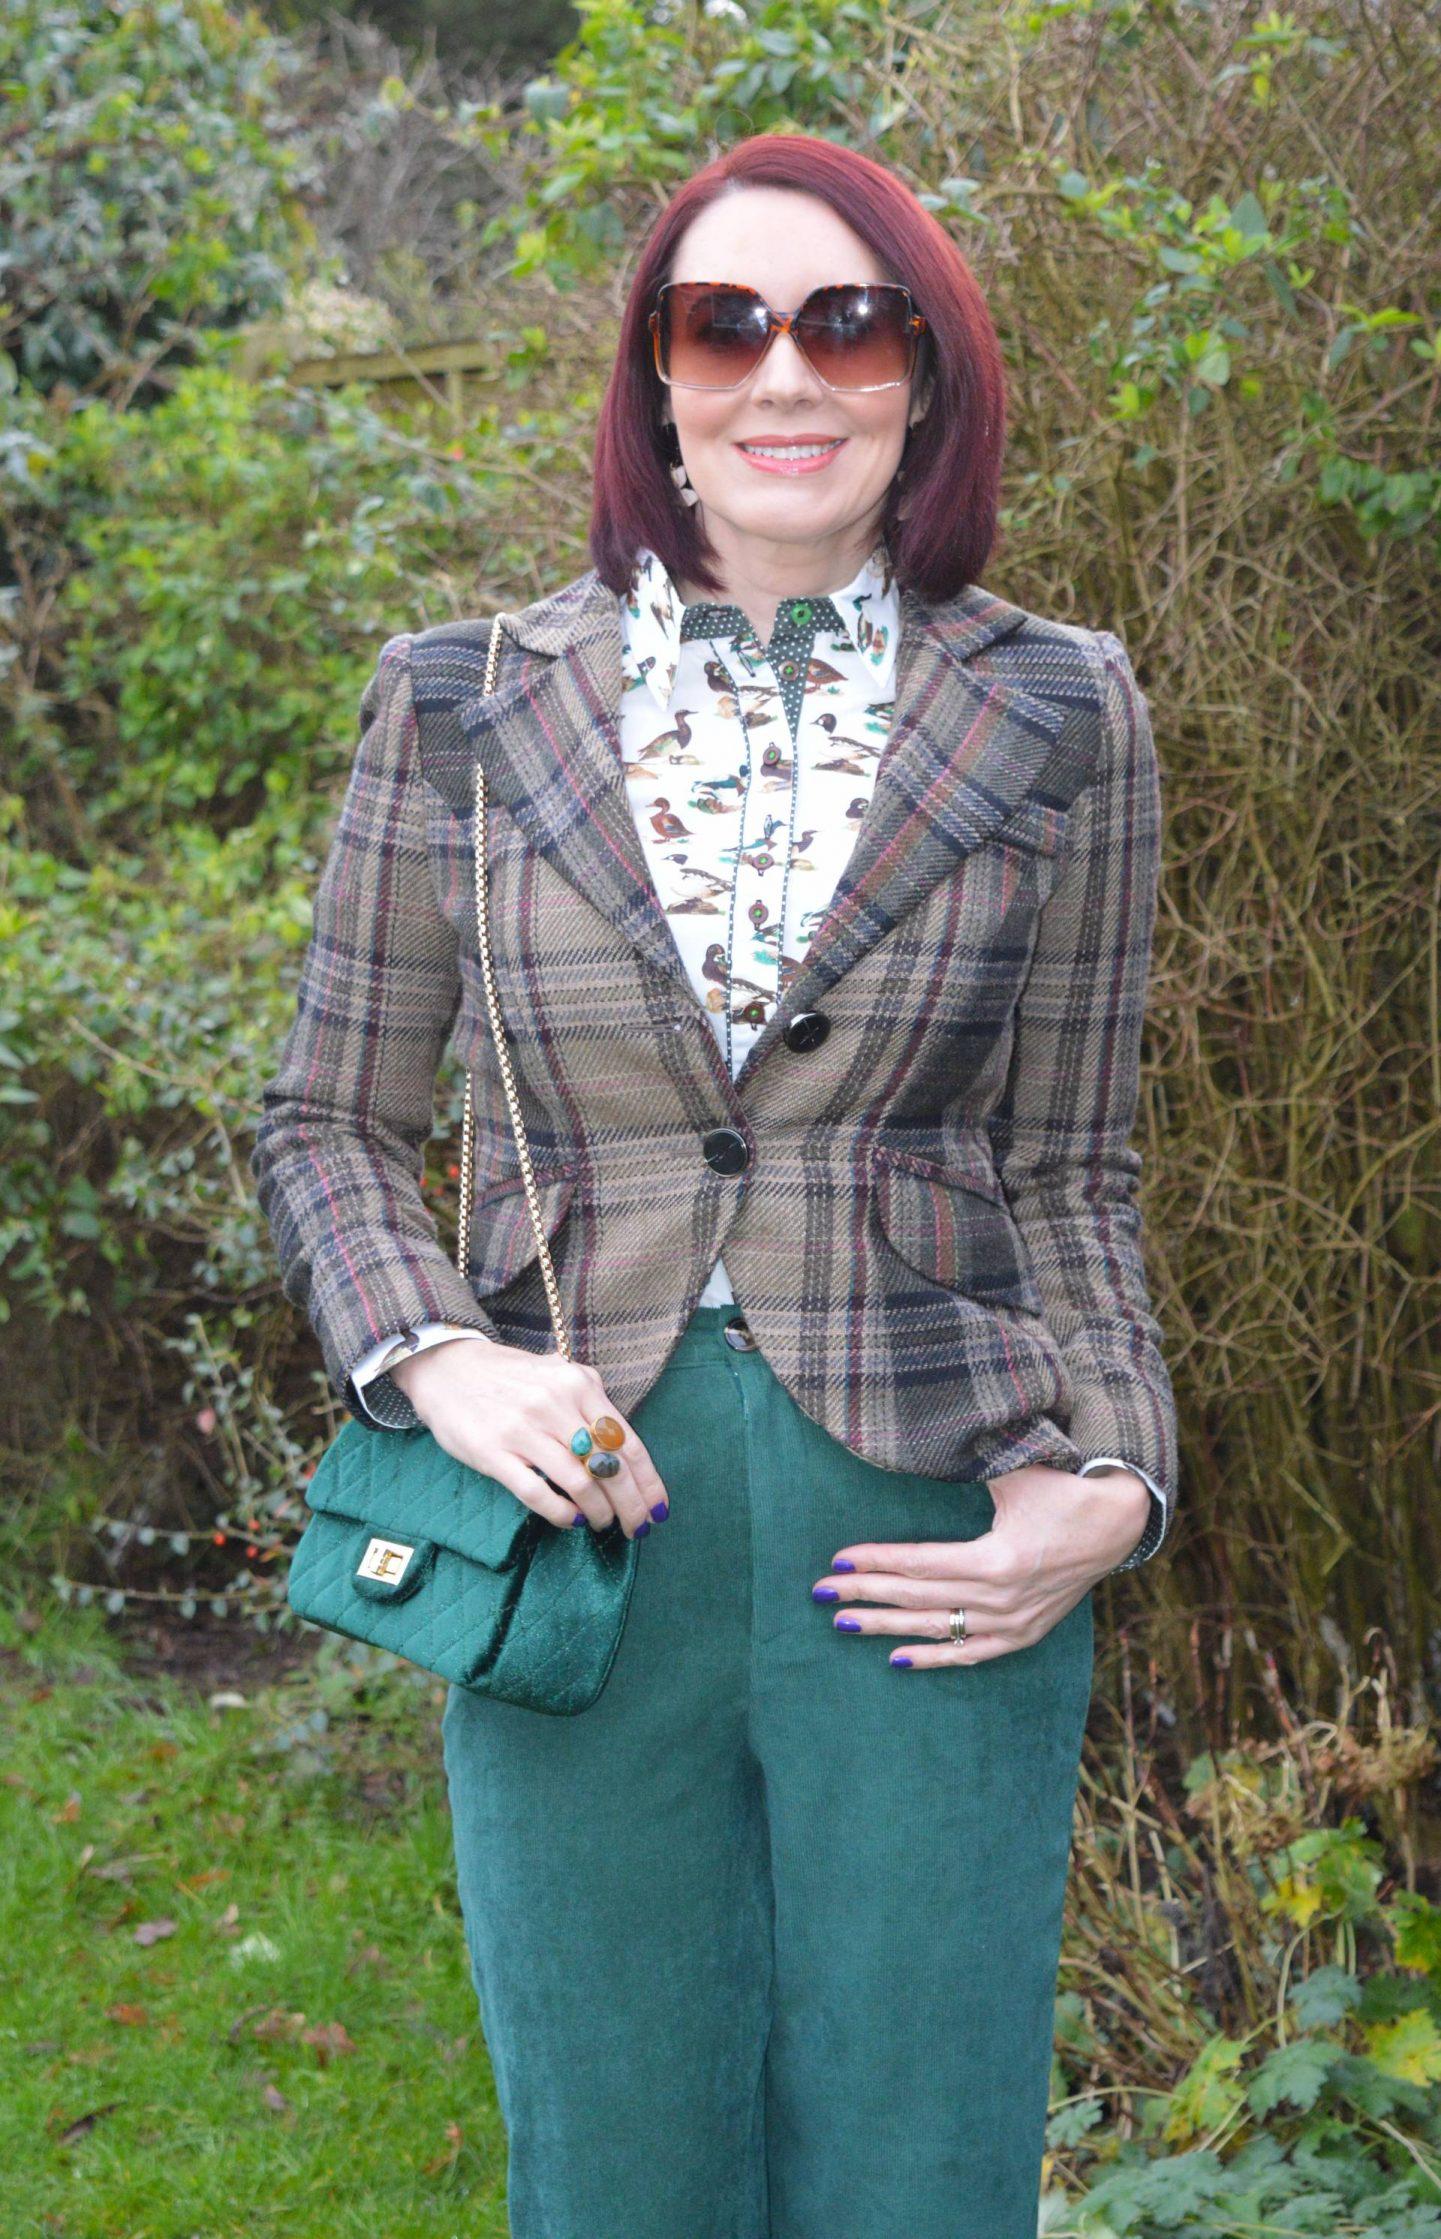 Salamander Shirts Duck Print Cotton Shirt, Coast baby cord forest green trousers, Mango tweed jacket, SVNX brown square sunglasses